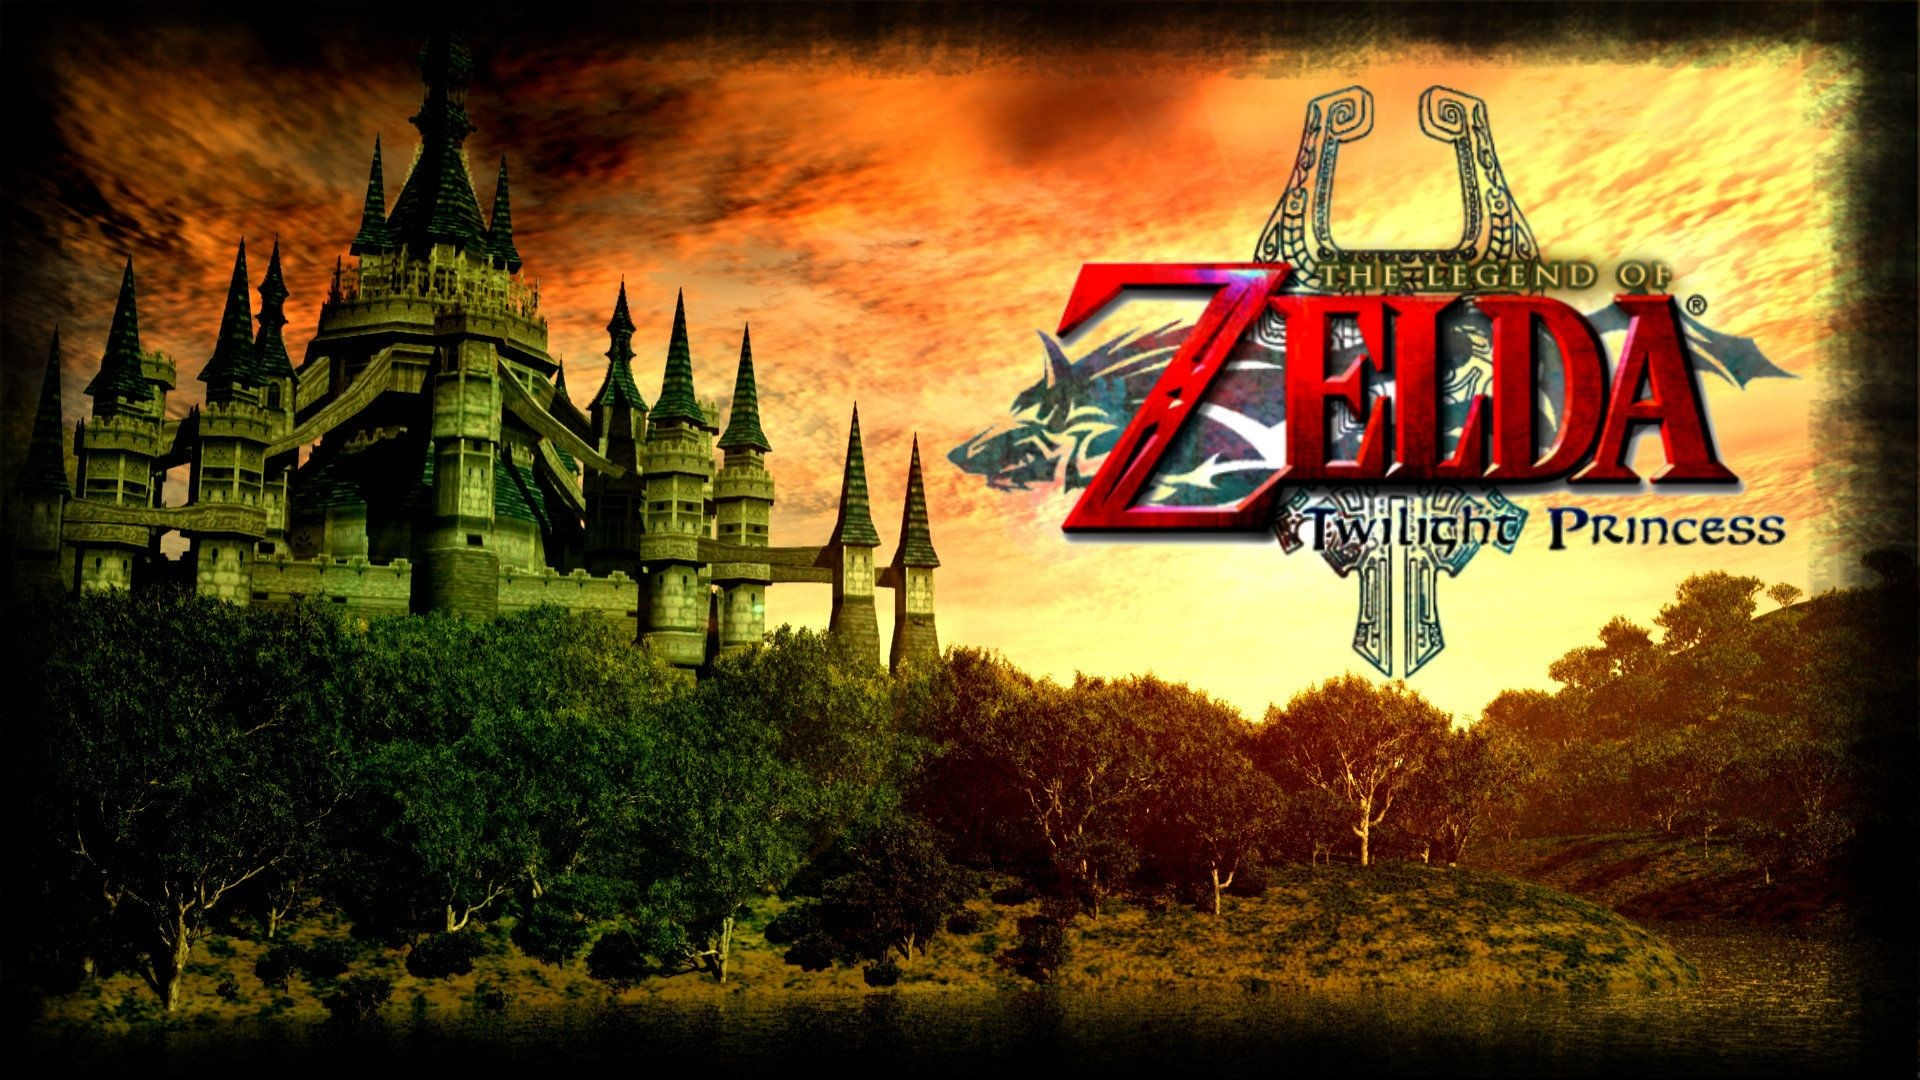 Legend Of Zelda Twilight Princess Wallpaper High Resolution For Desktop  Wallpaper 1920 x 1080 px 623.08